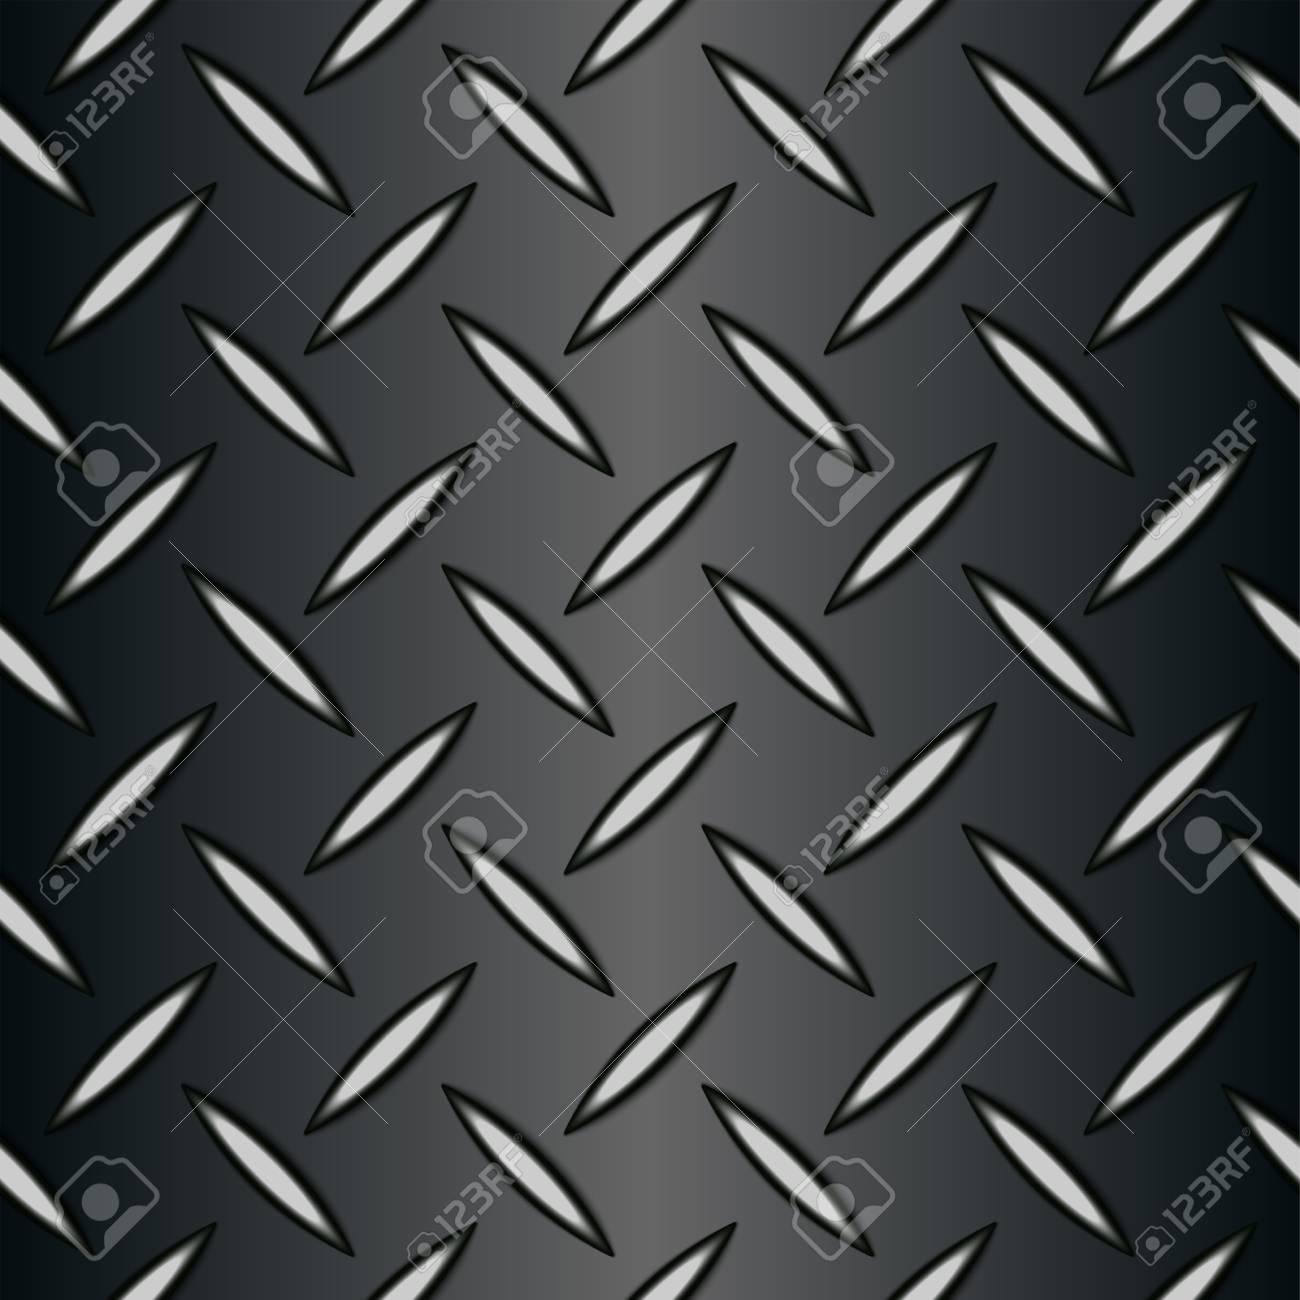 Metal Background Of Seamless Diamond Plate Texture Wallpaper